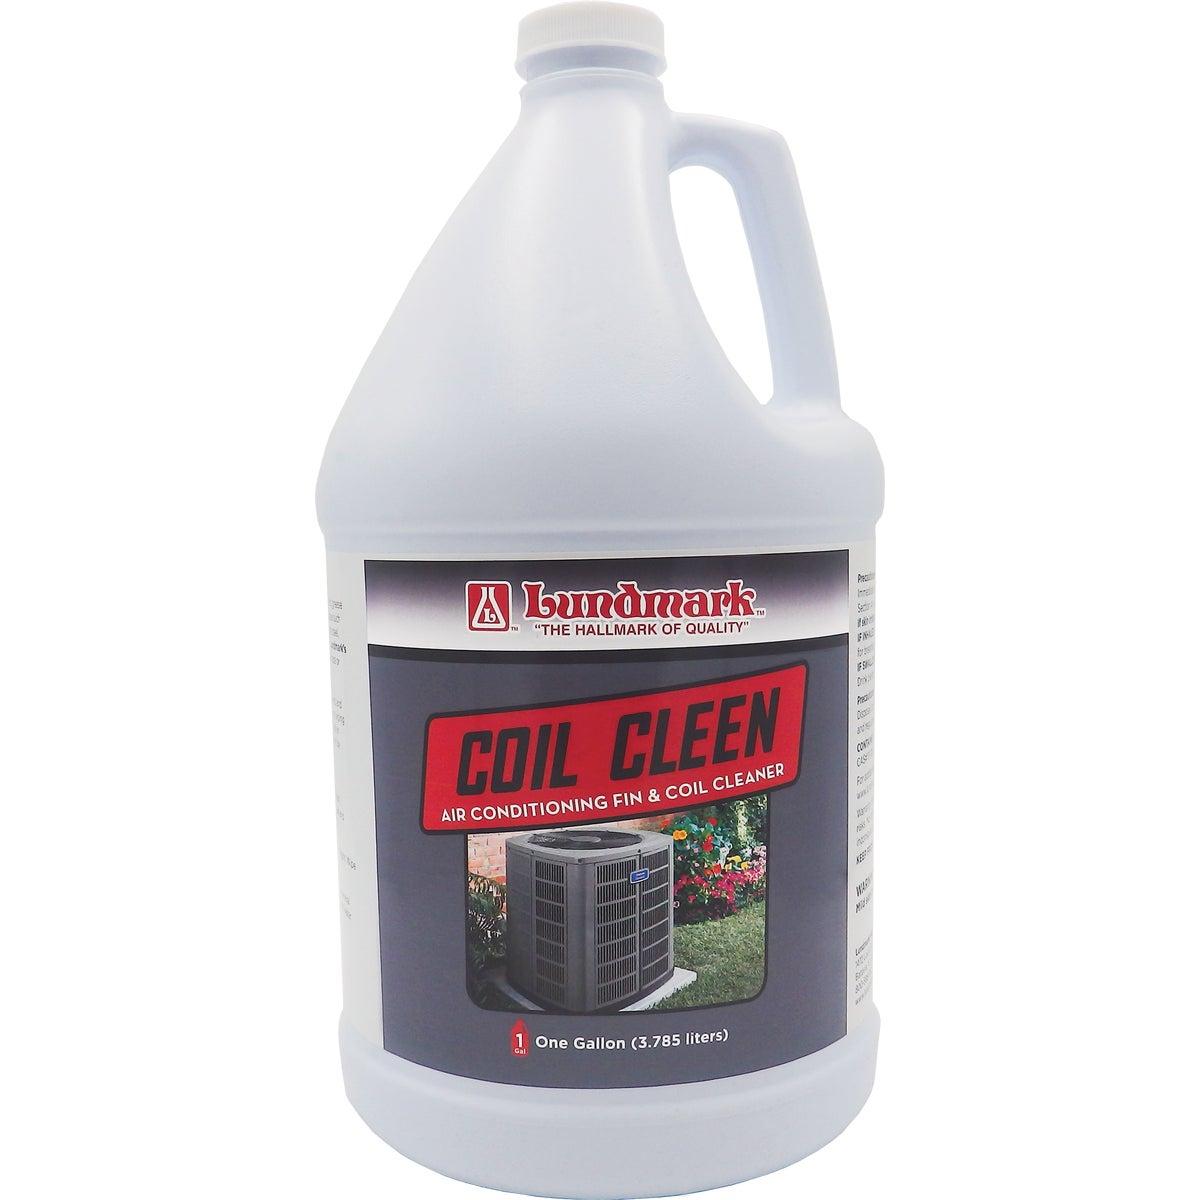 Gallon Coil Cleen